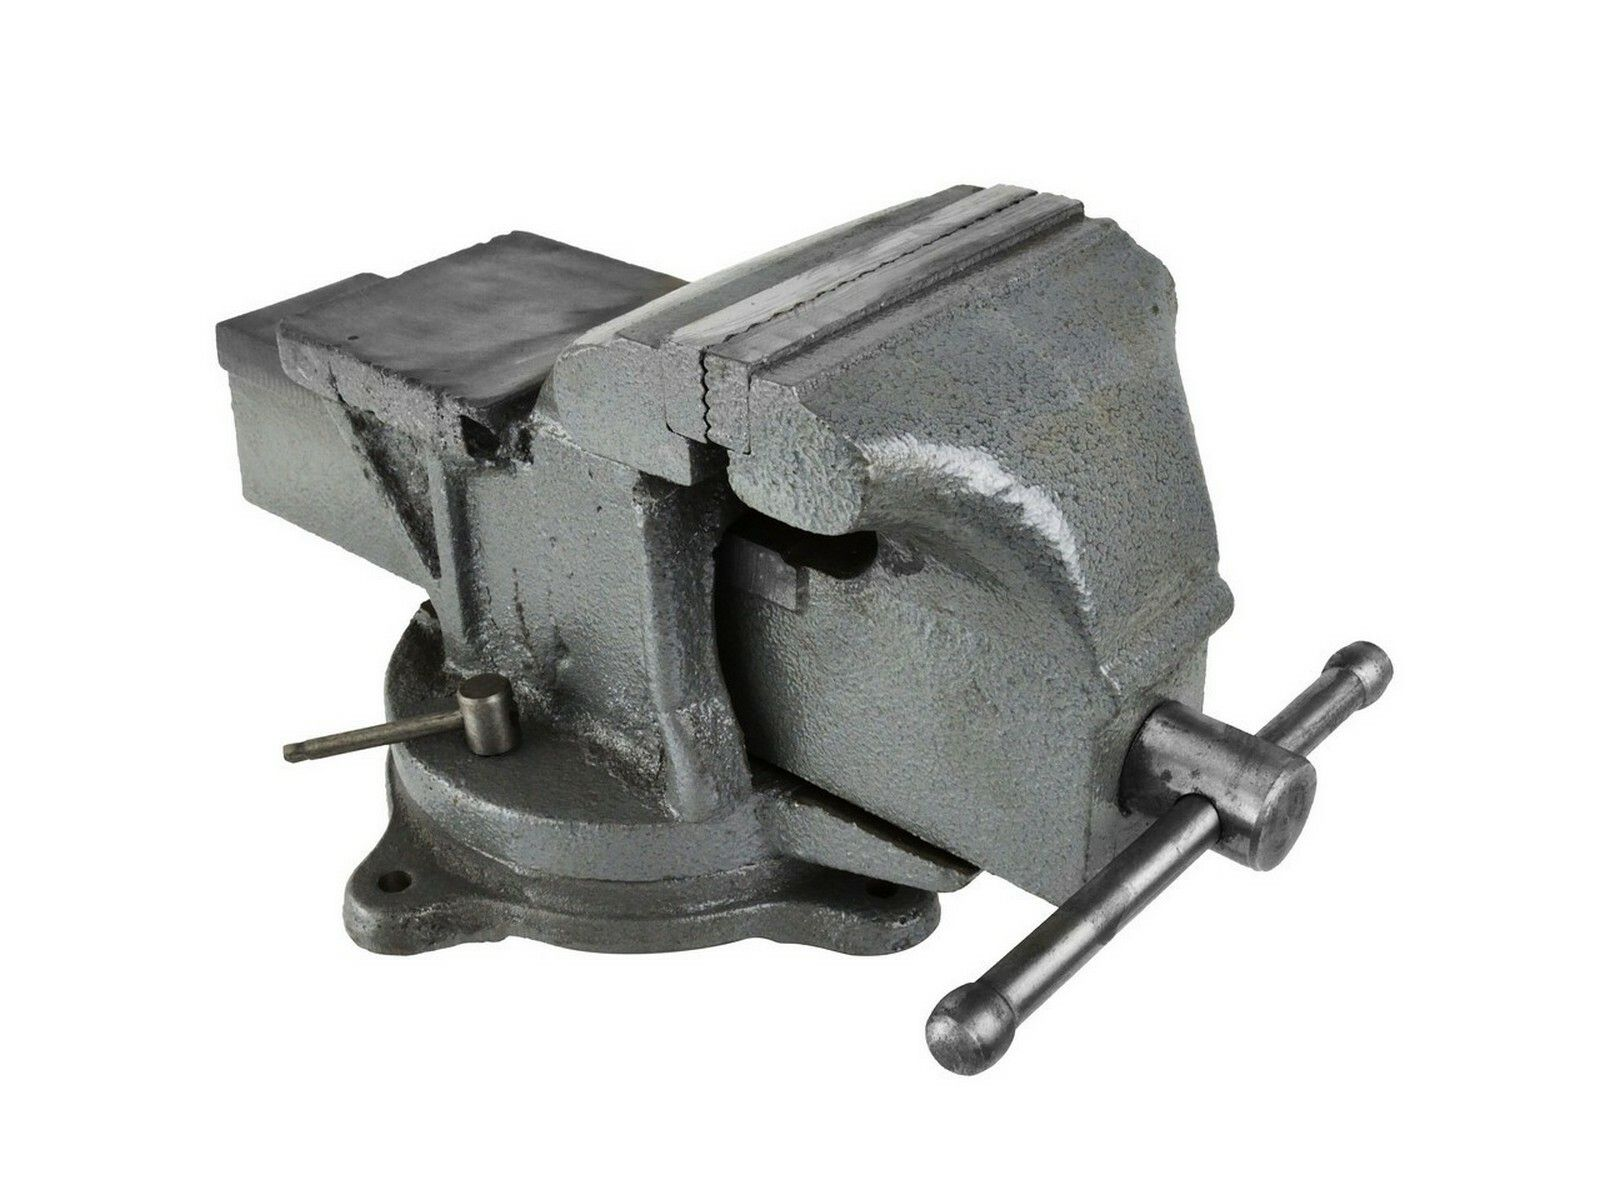 "Svěrák otočný s kovadlinou. 125mm/5"". 14kg GEKO"